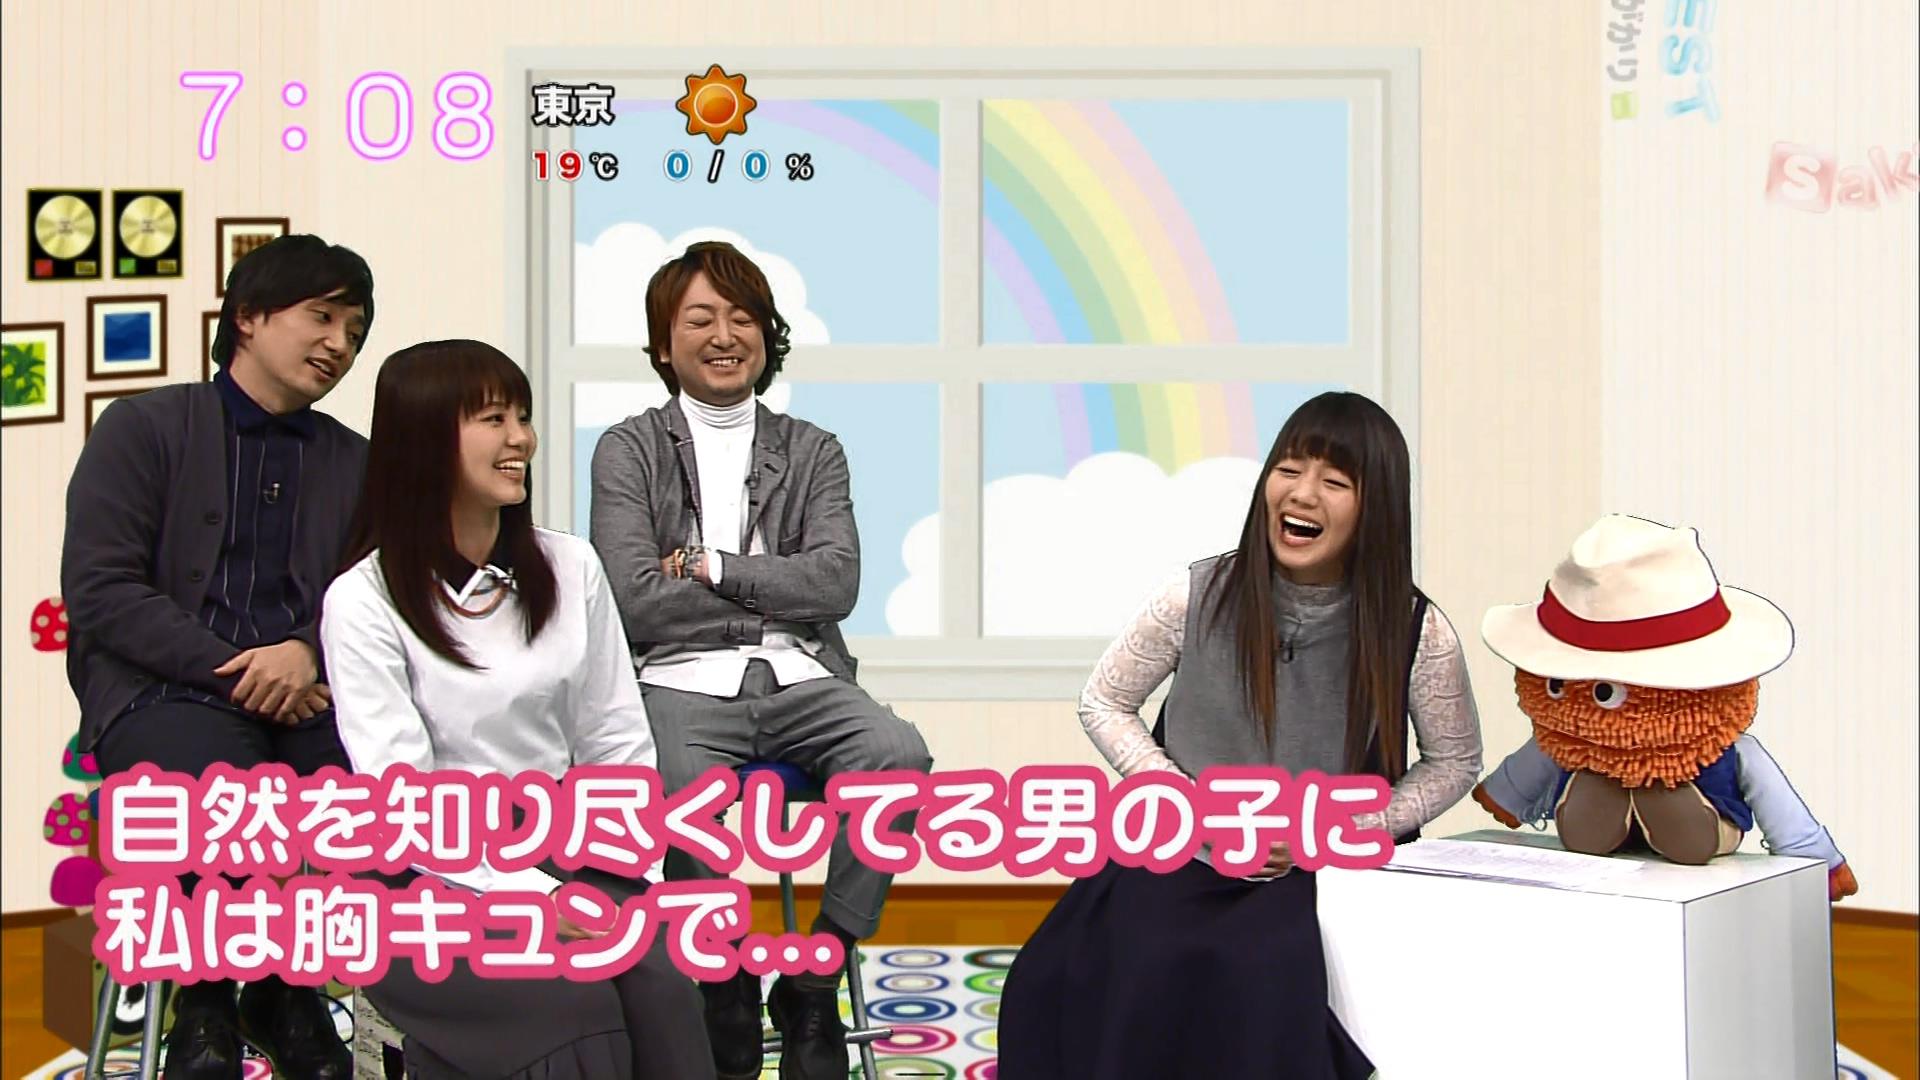 2016.03.17 いきものがかり(saku saku).ts_20160317_080252.734